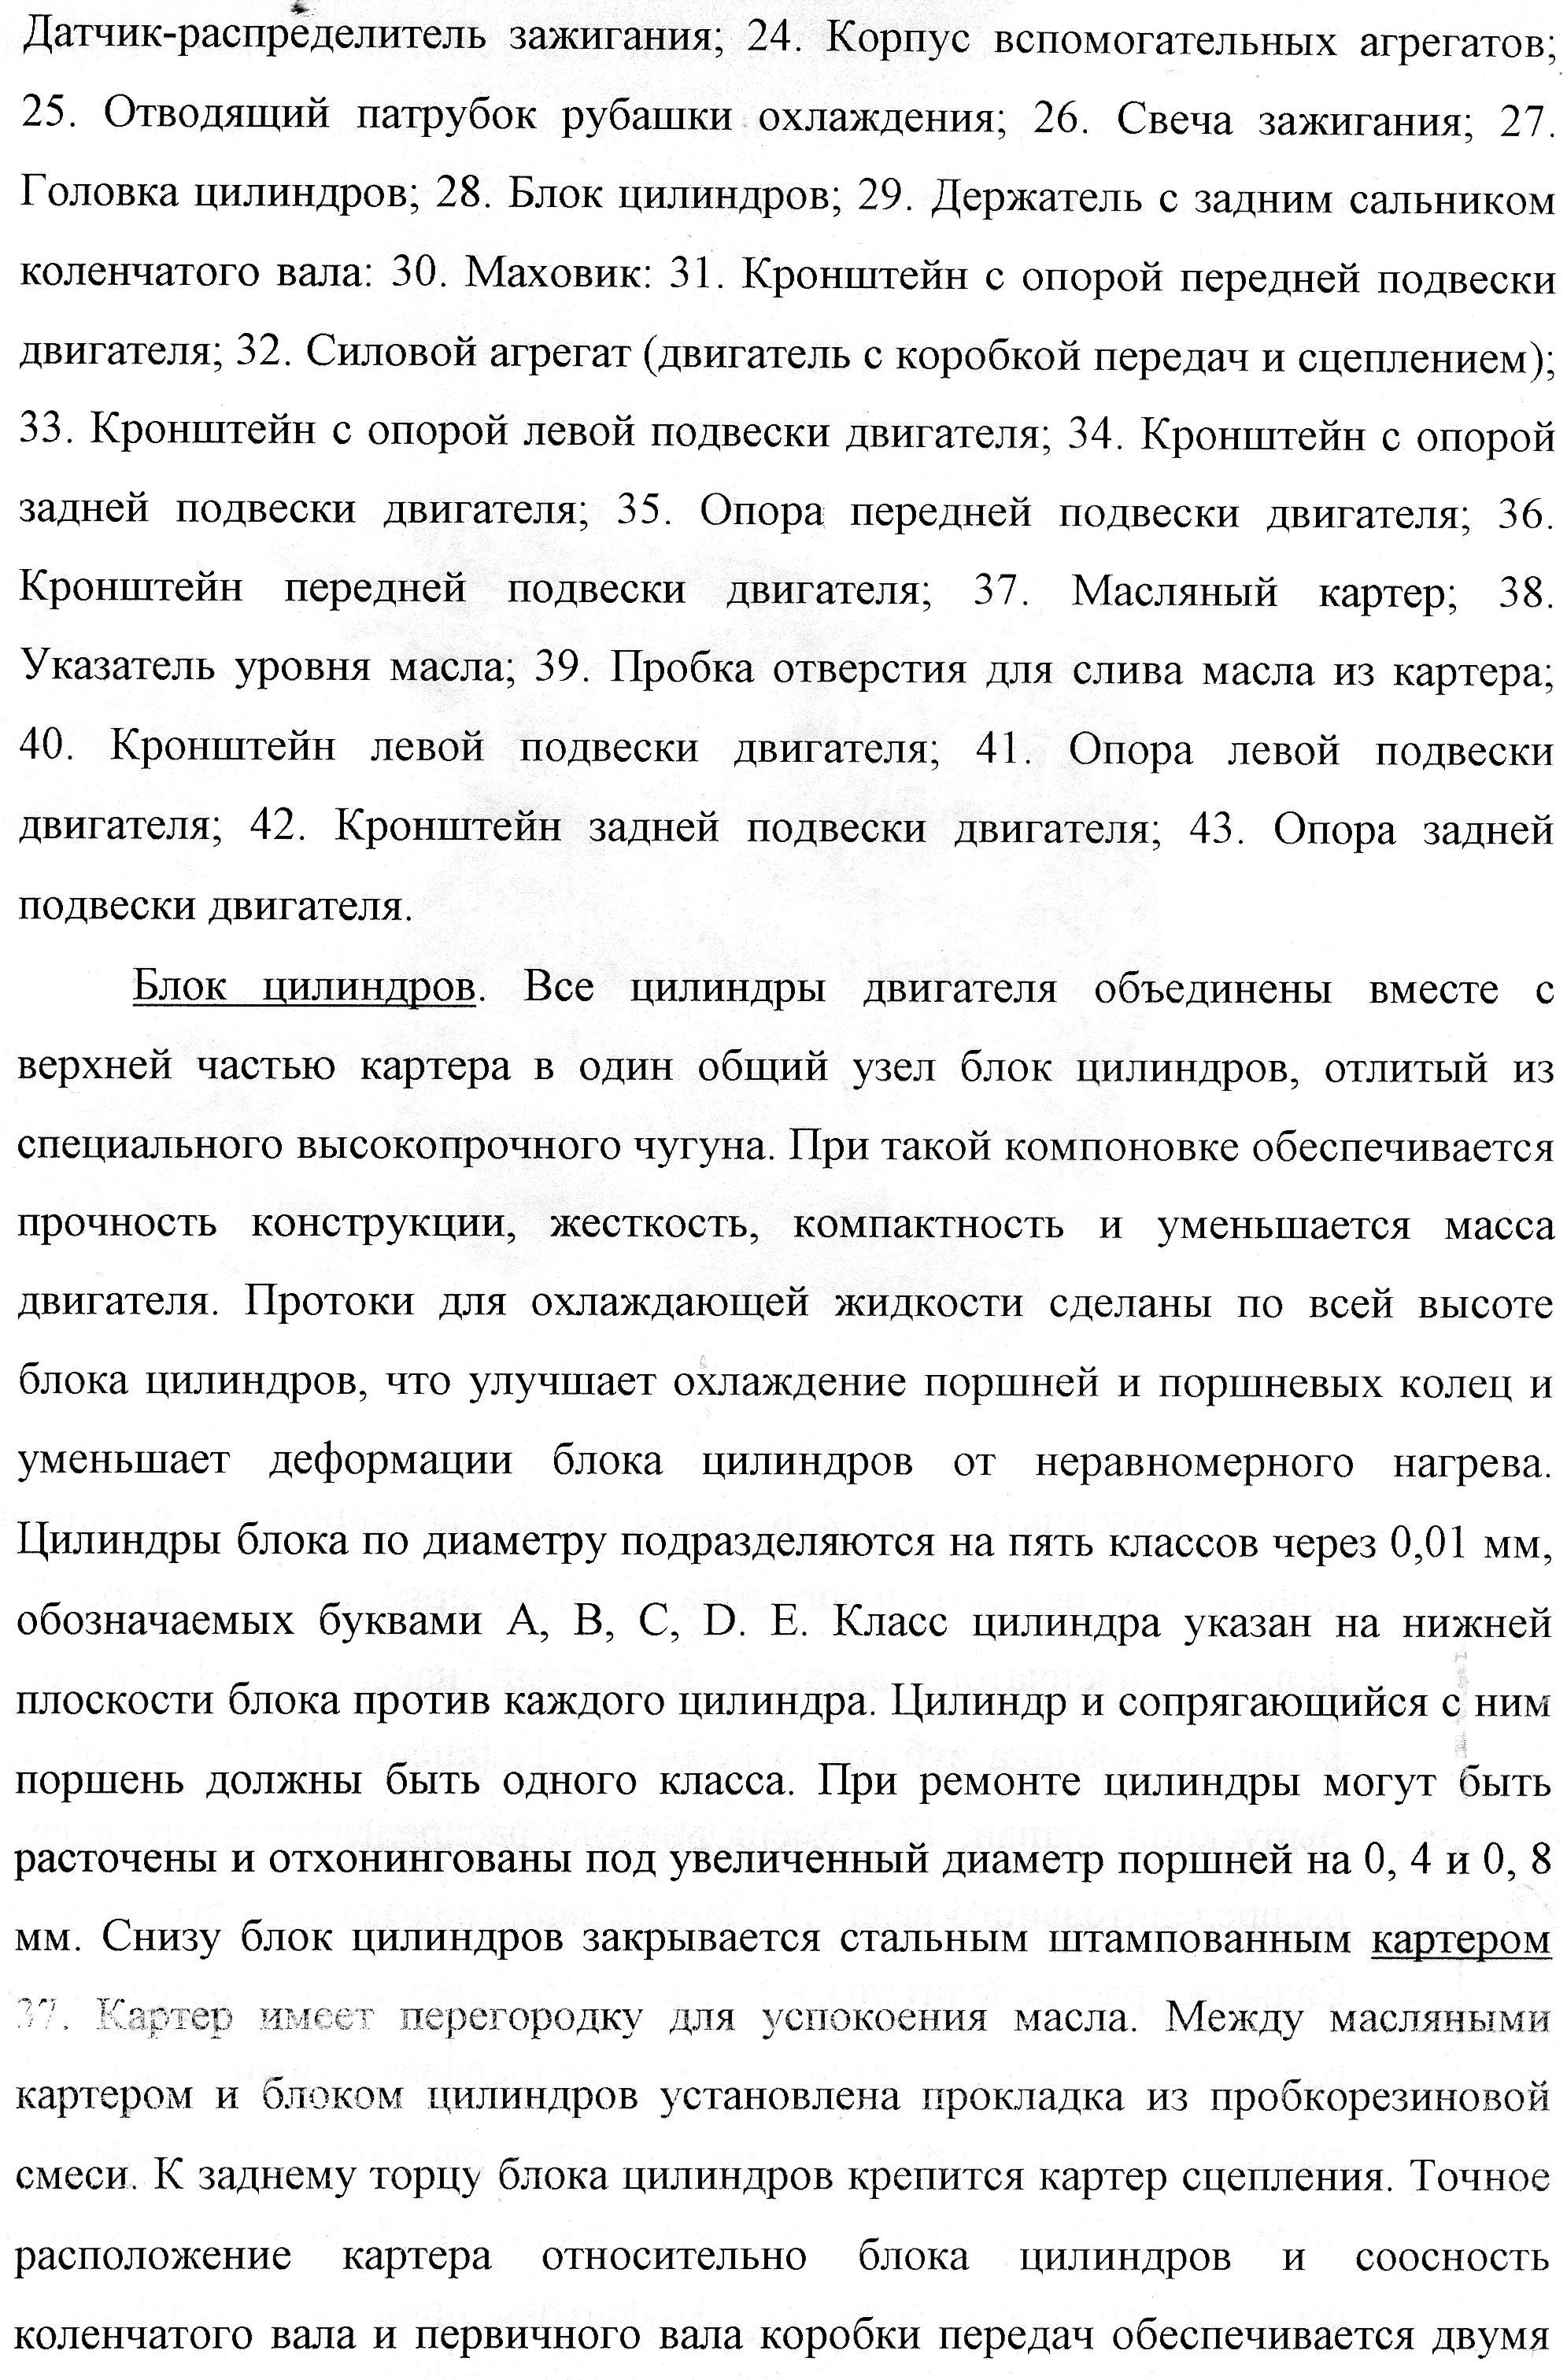 C:\Users\Василий Мельченко\Pictures\img597.jpg